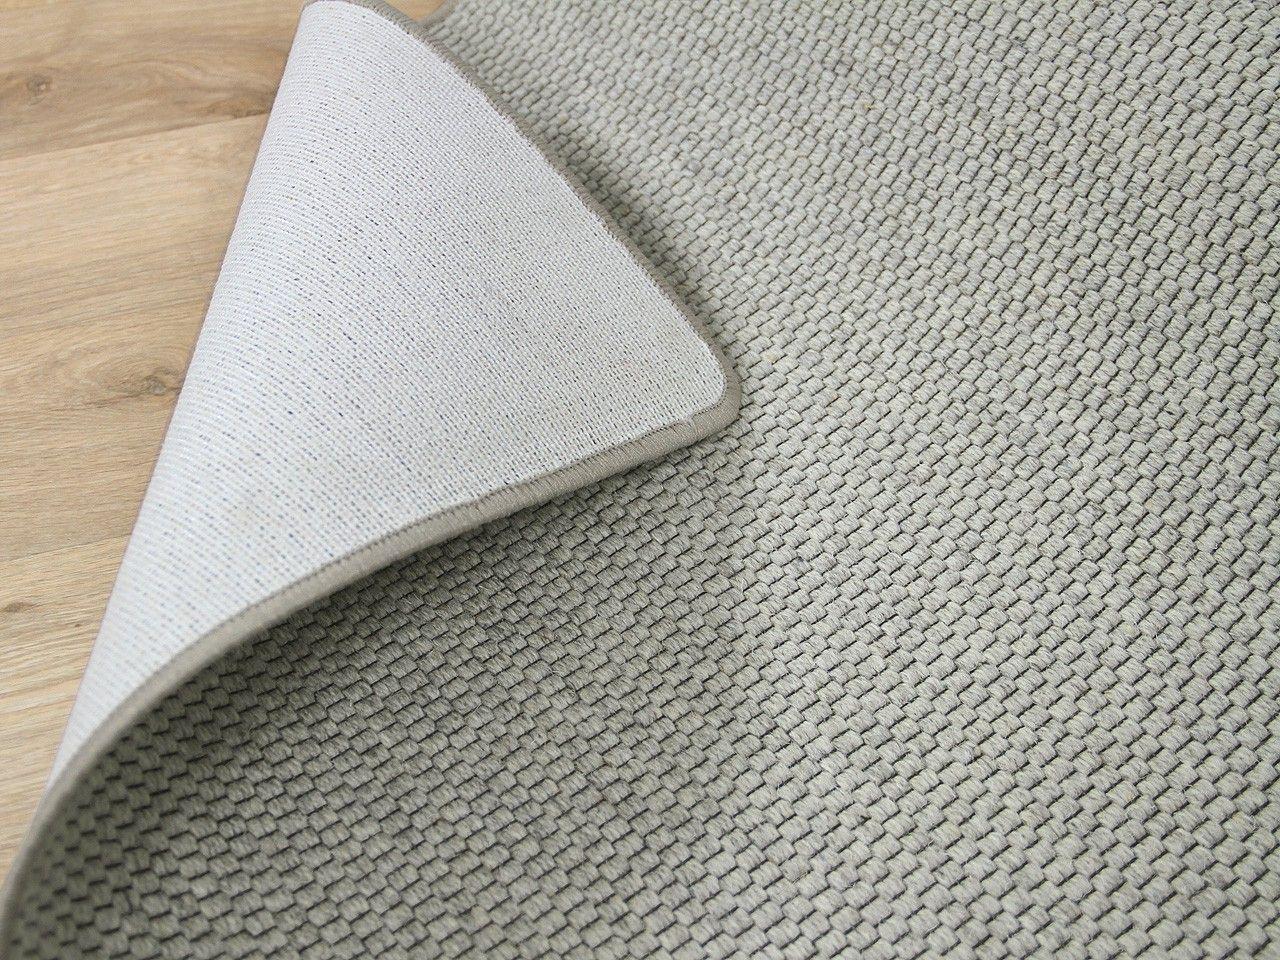 Natur Teppich Wolle Bentzon Flachgewebe Grau Pinterest